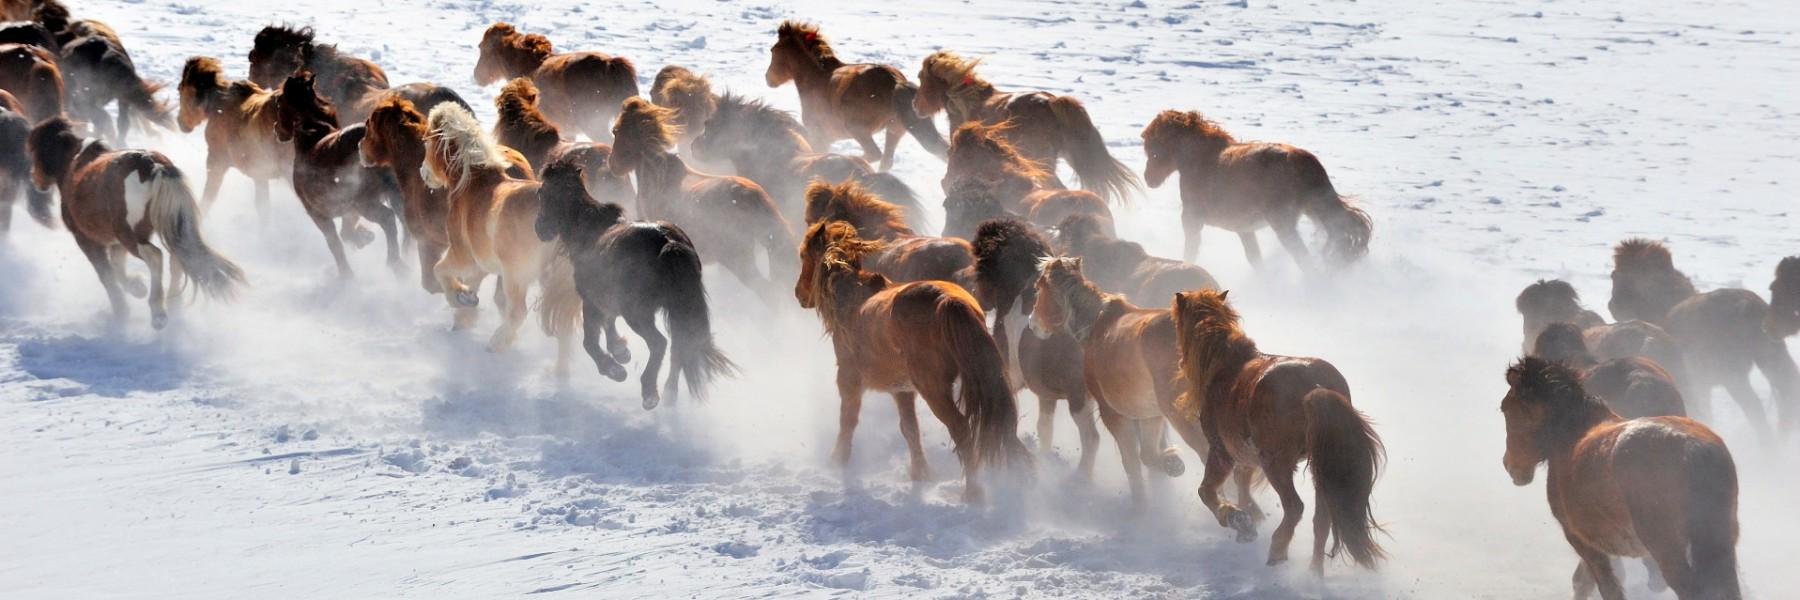 wild-horses-running-picture-id682125704